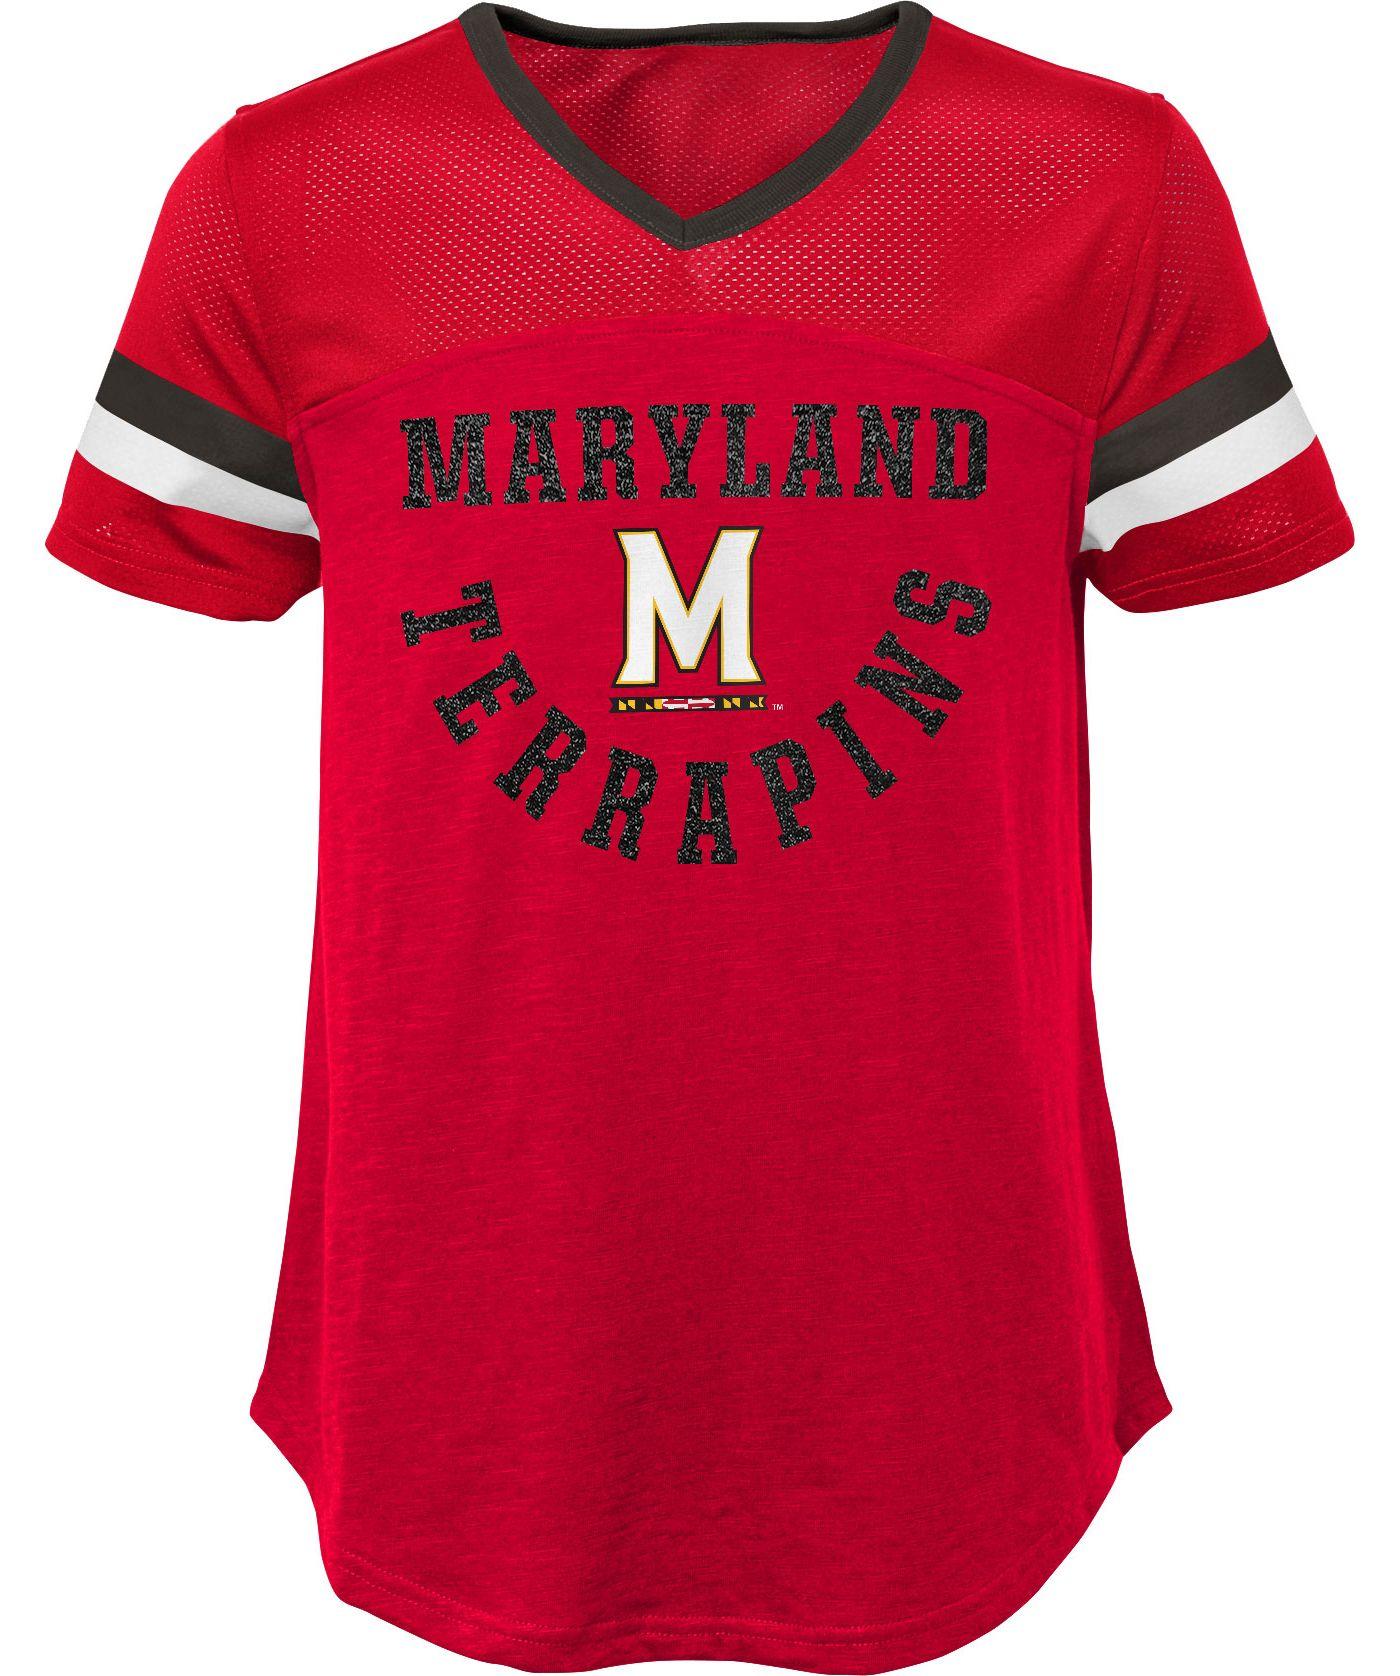 Gen2 Girls' Maryland Terrapins Red Game Plan T-Shirt